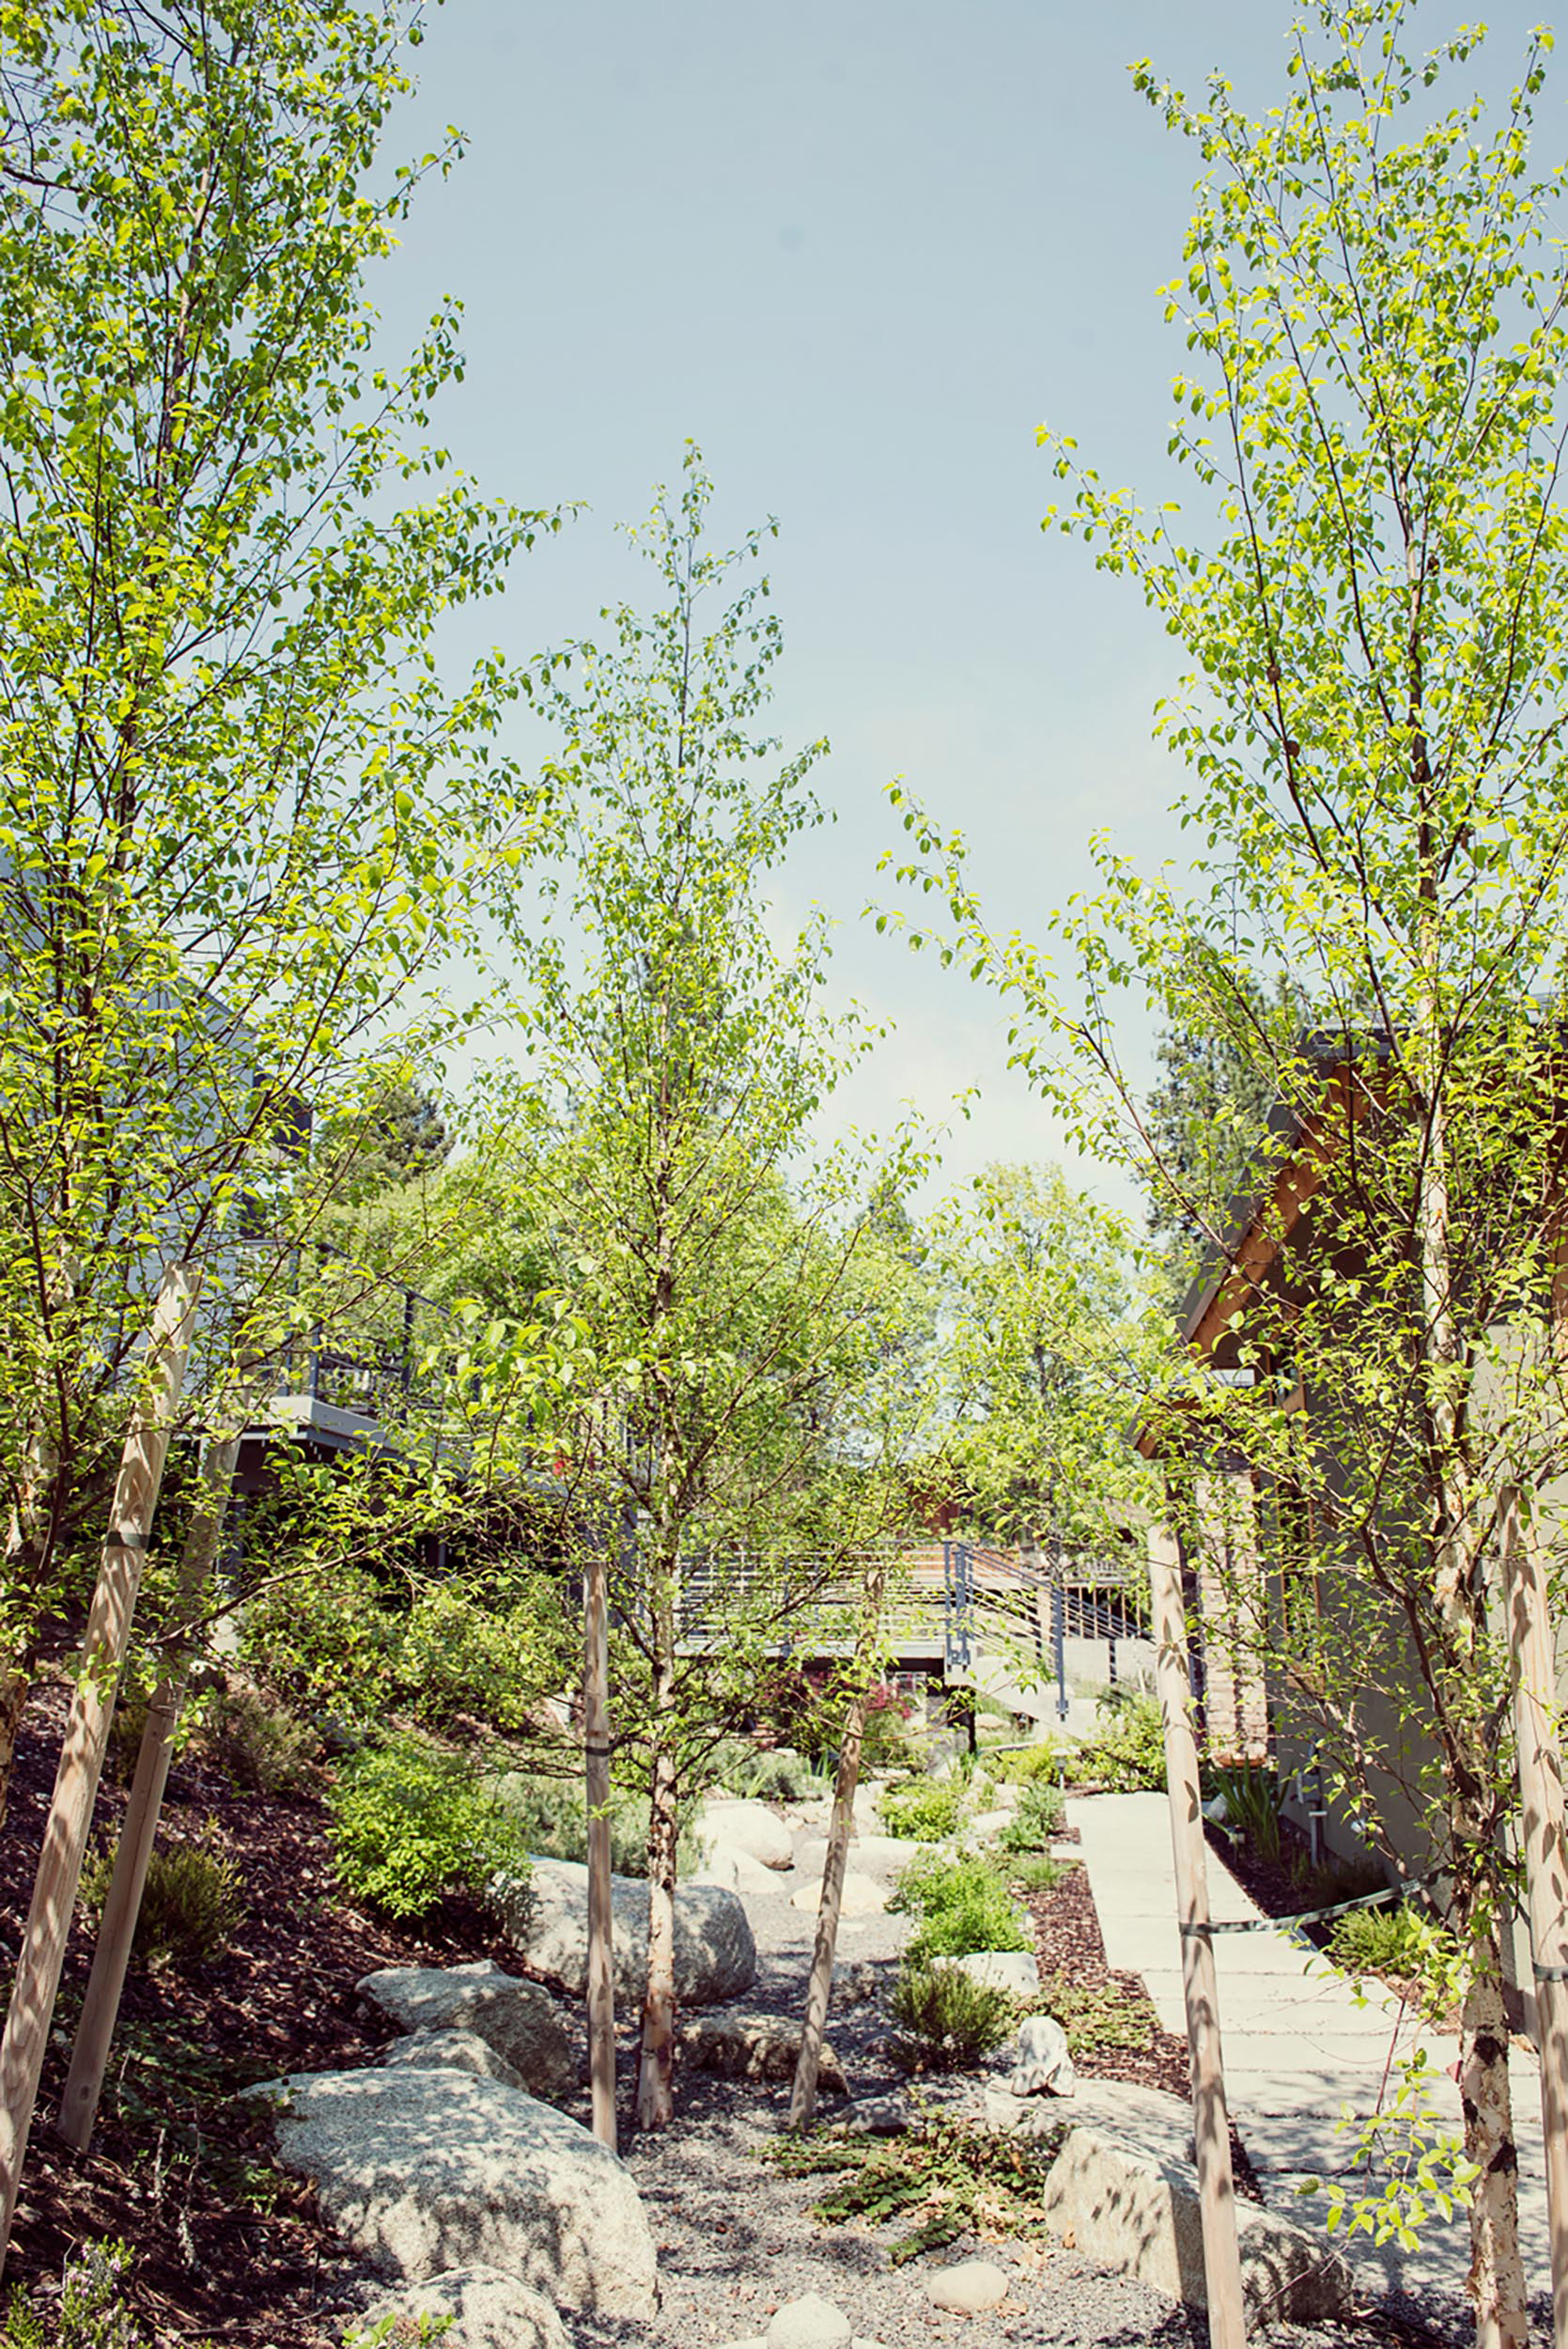 Rive birch + seasonal sustainable man made crushed gravel + granite boulder creek bed + segmented concrete pathways + concrete + steel stairs and bridge.jpg